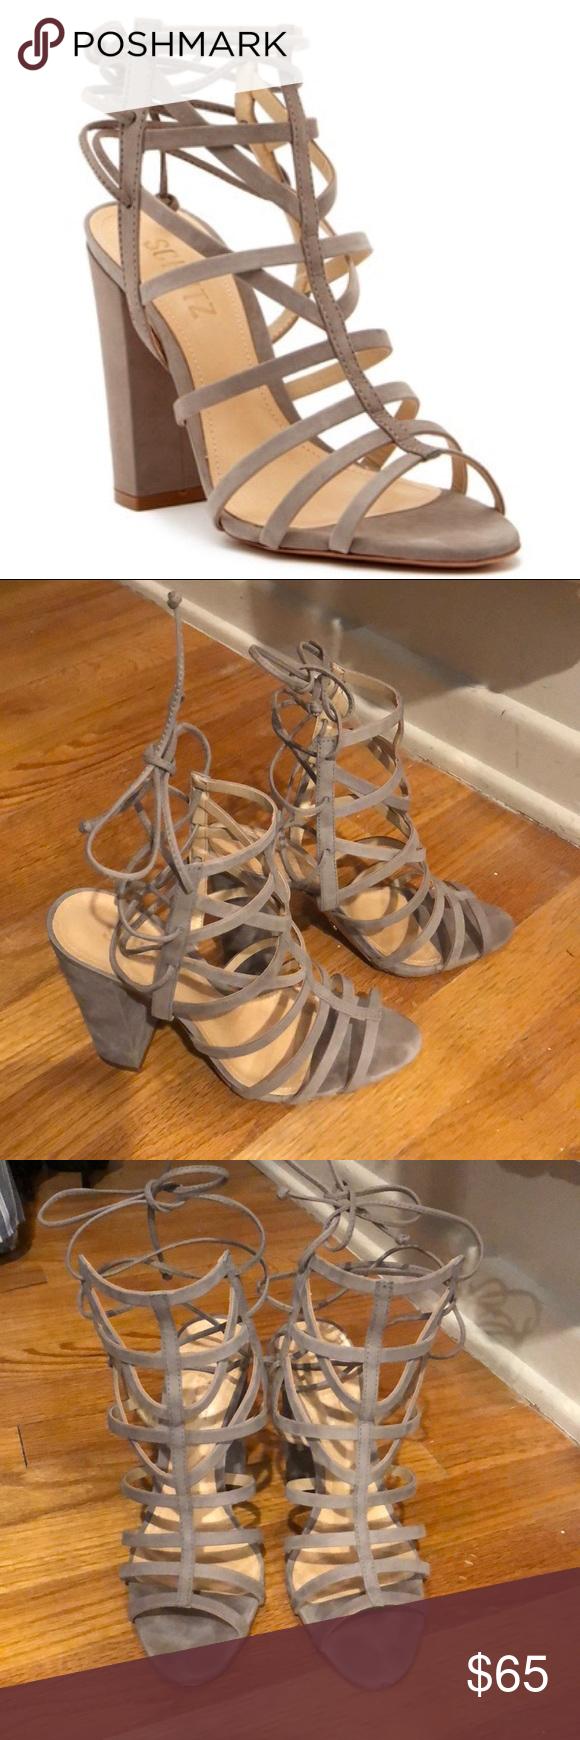 Schutz Loriana Caged Block Heel Sandal Size 7 Beautiful Schutz caged block heel sandals in grey/taup...